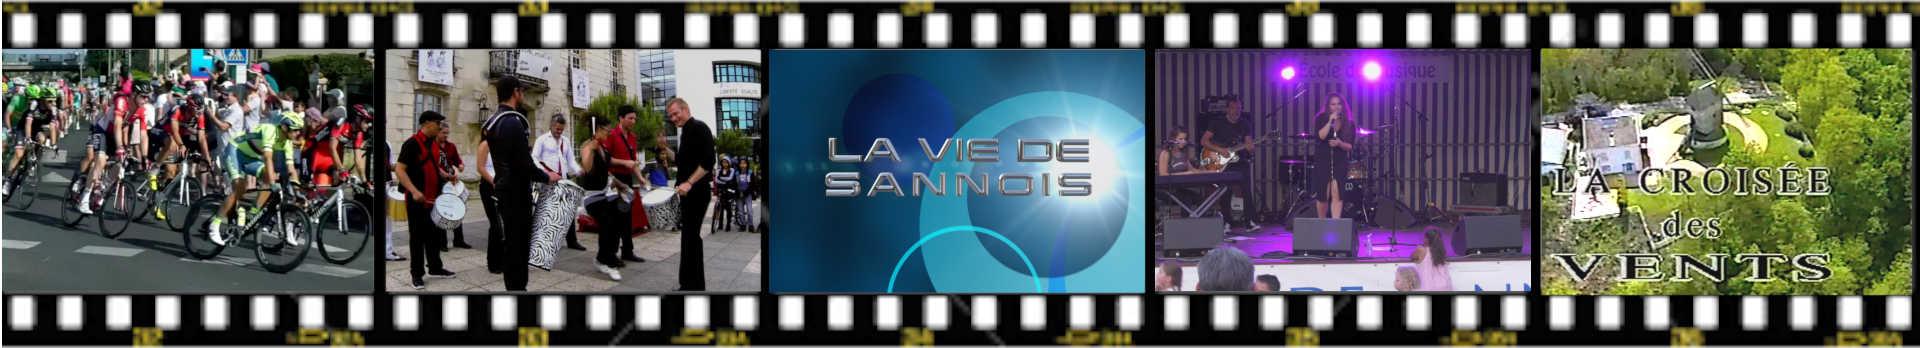 La vie de Sannois